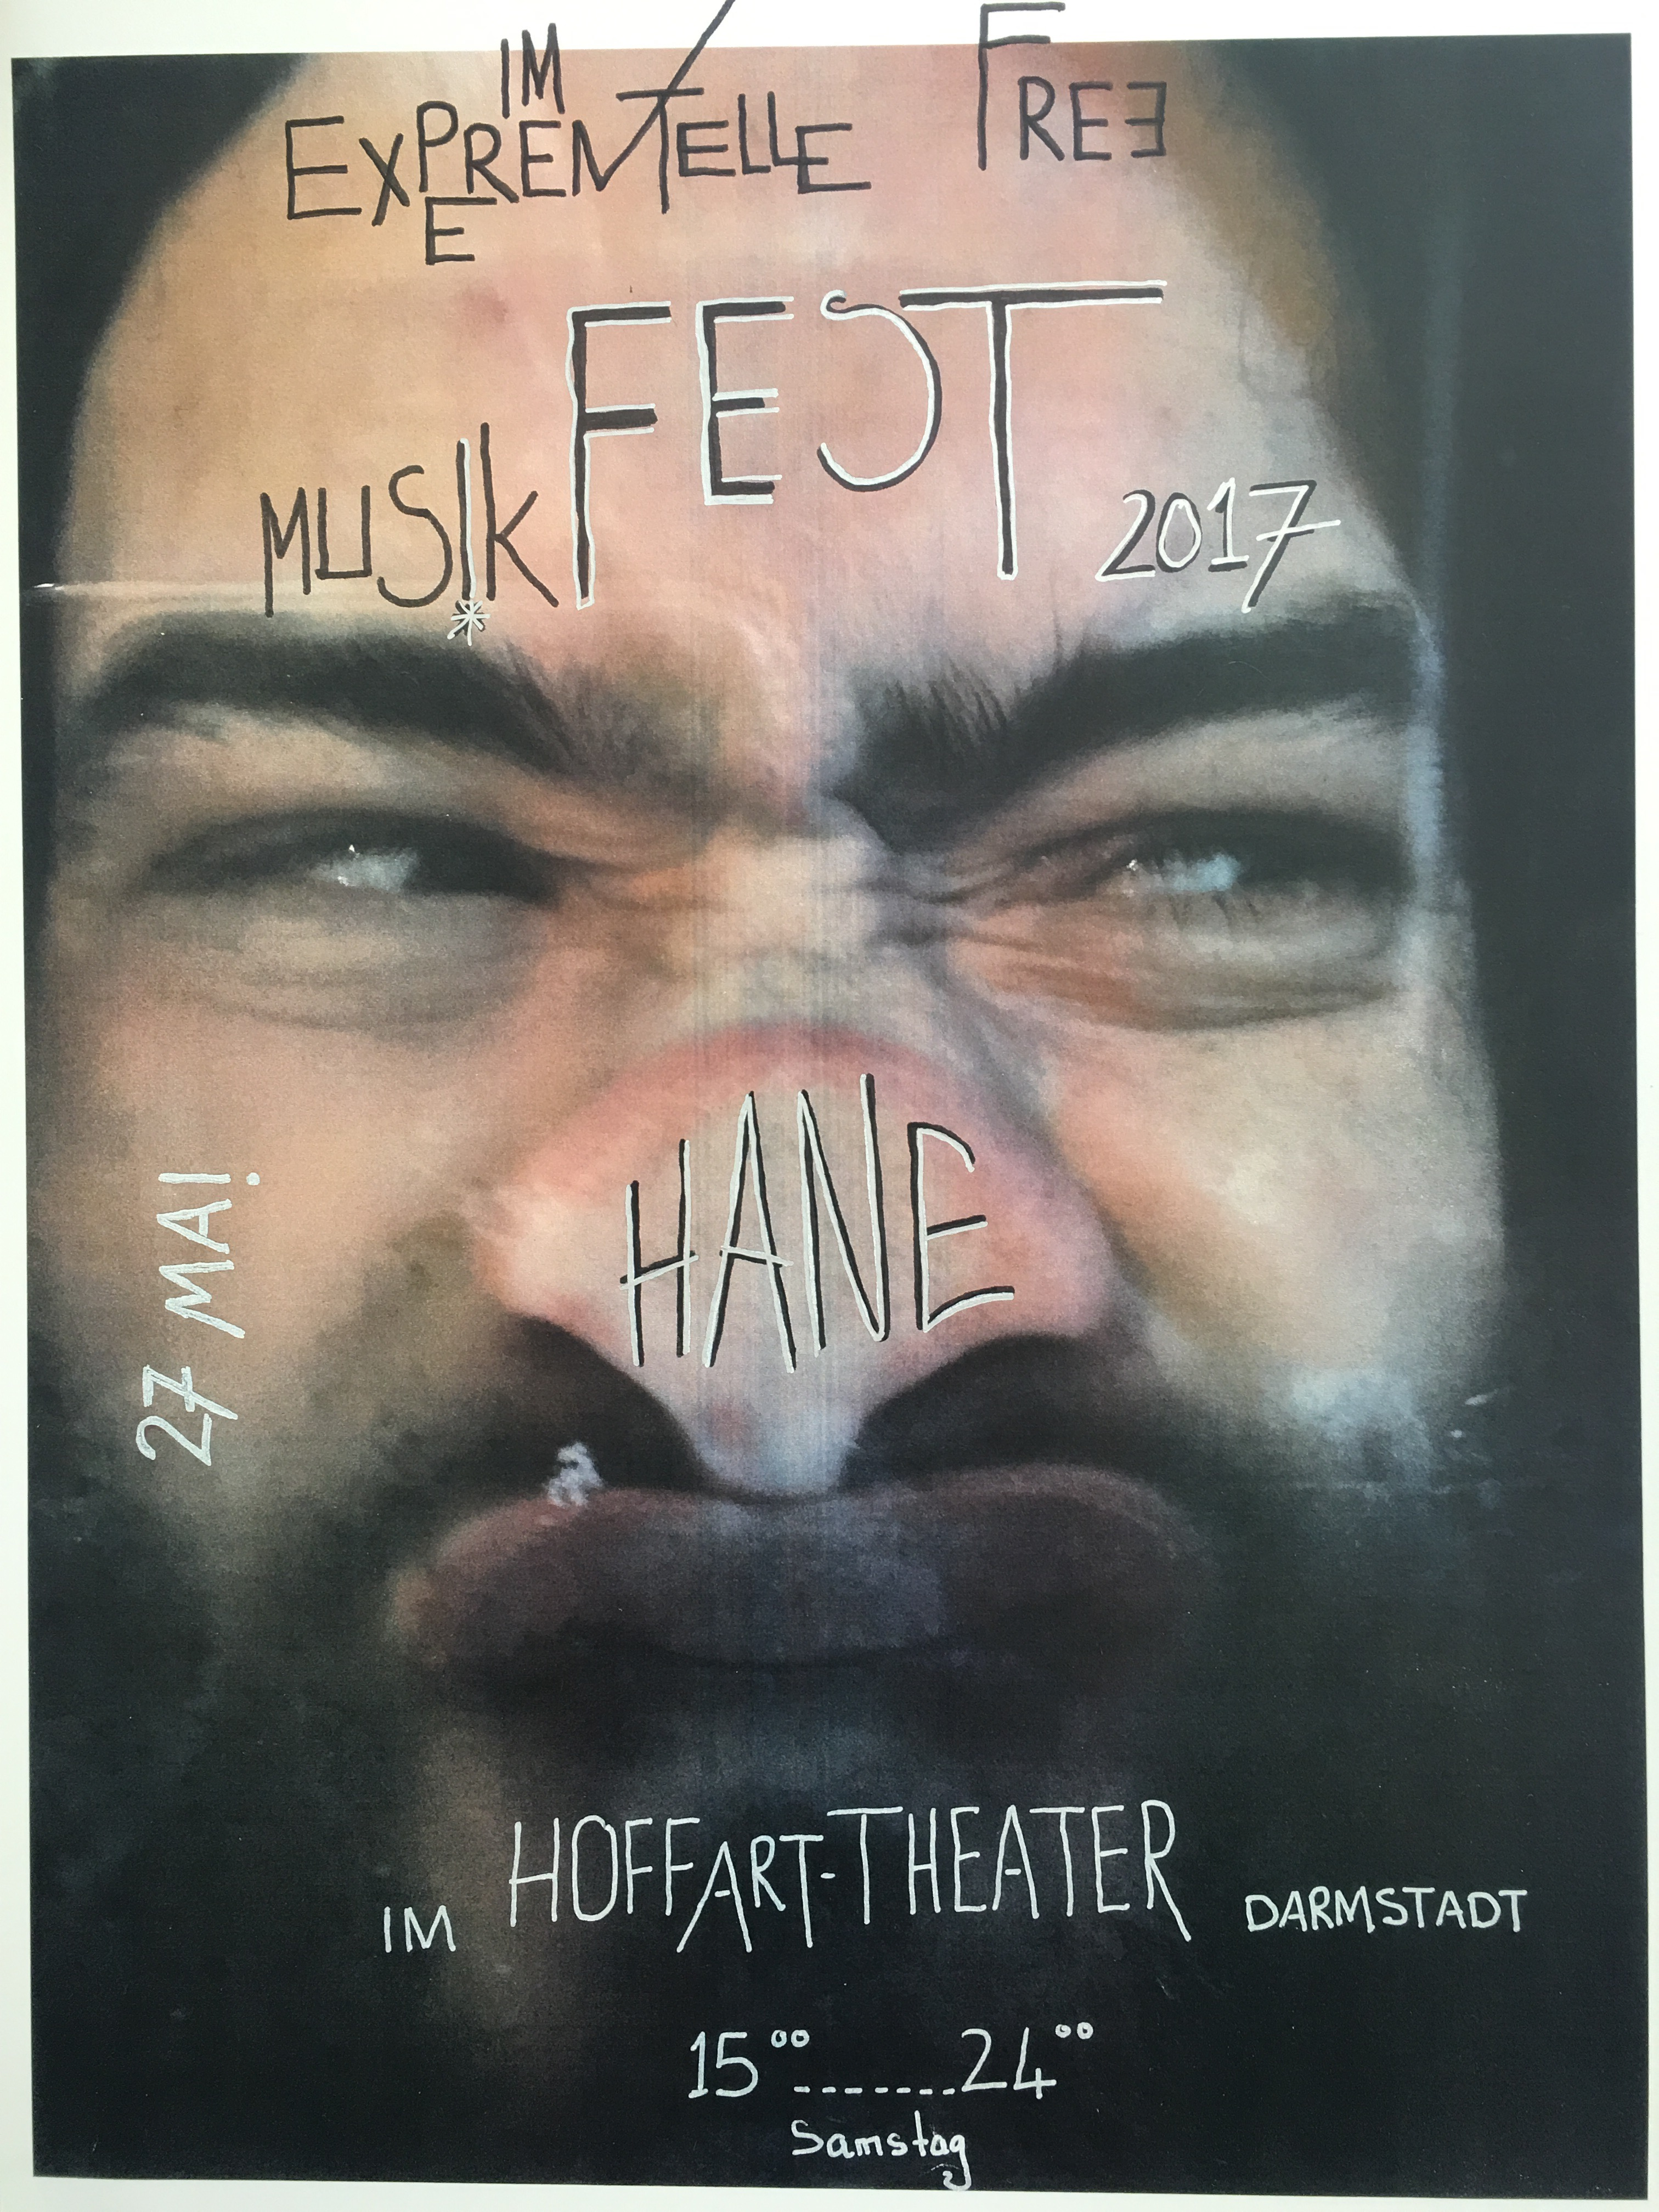 HANE: Experimentelles Free Musik Fest